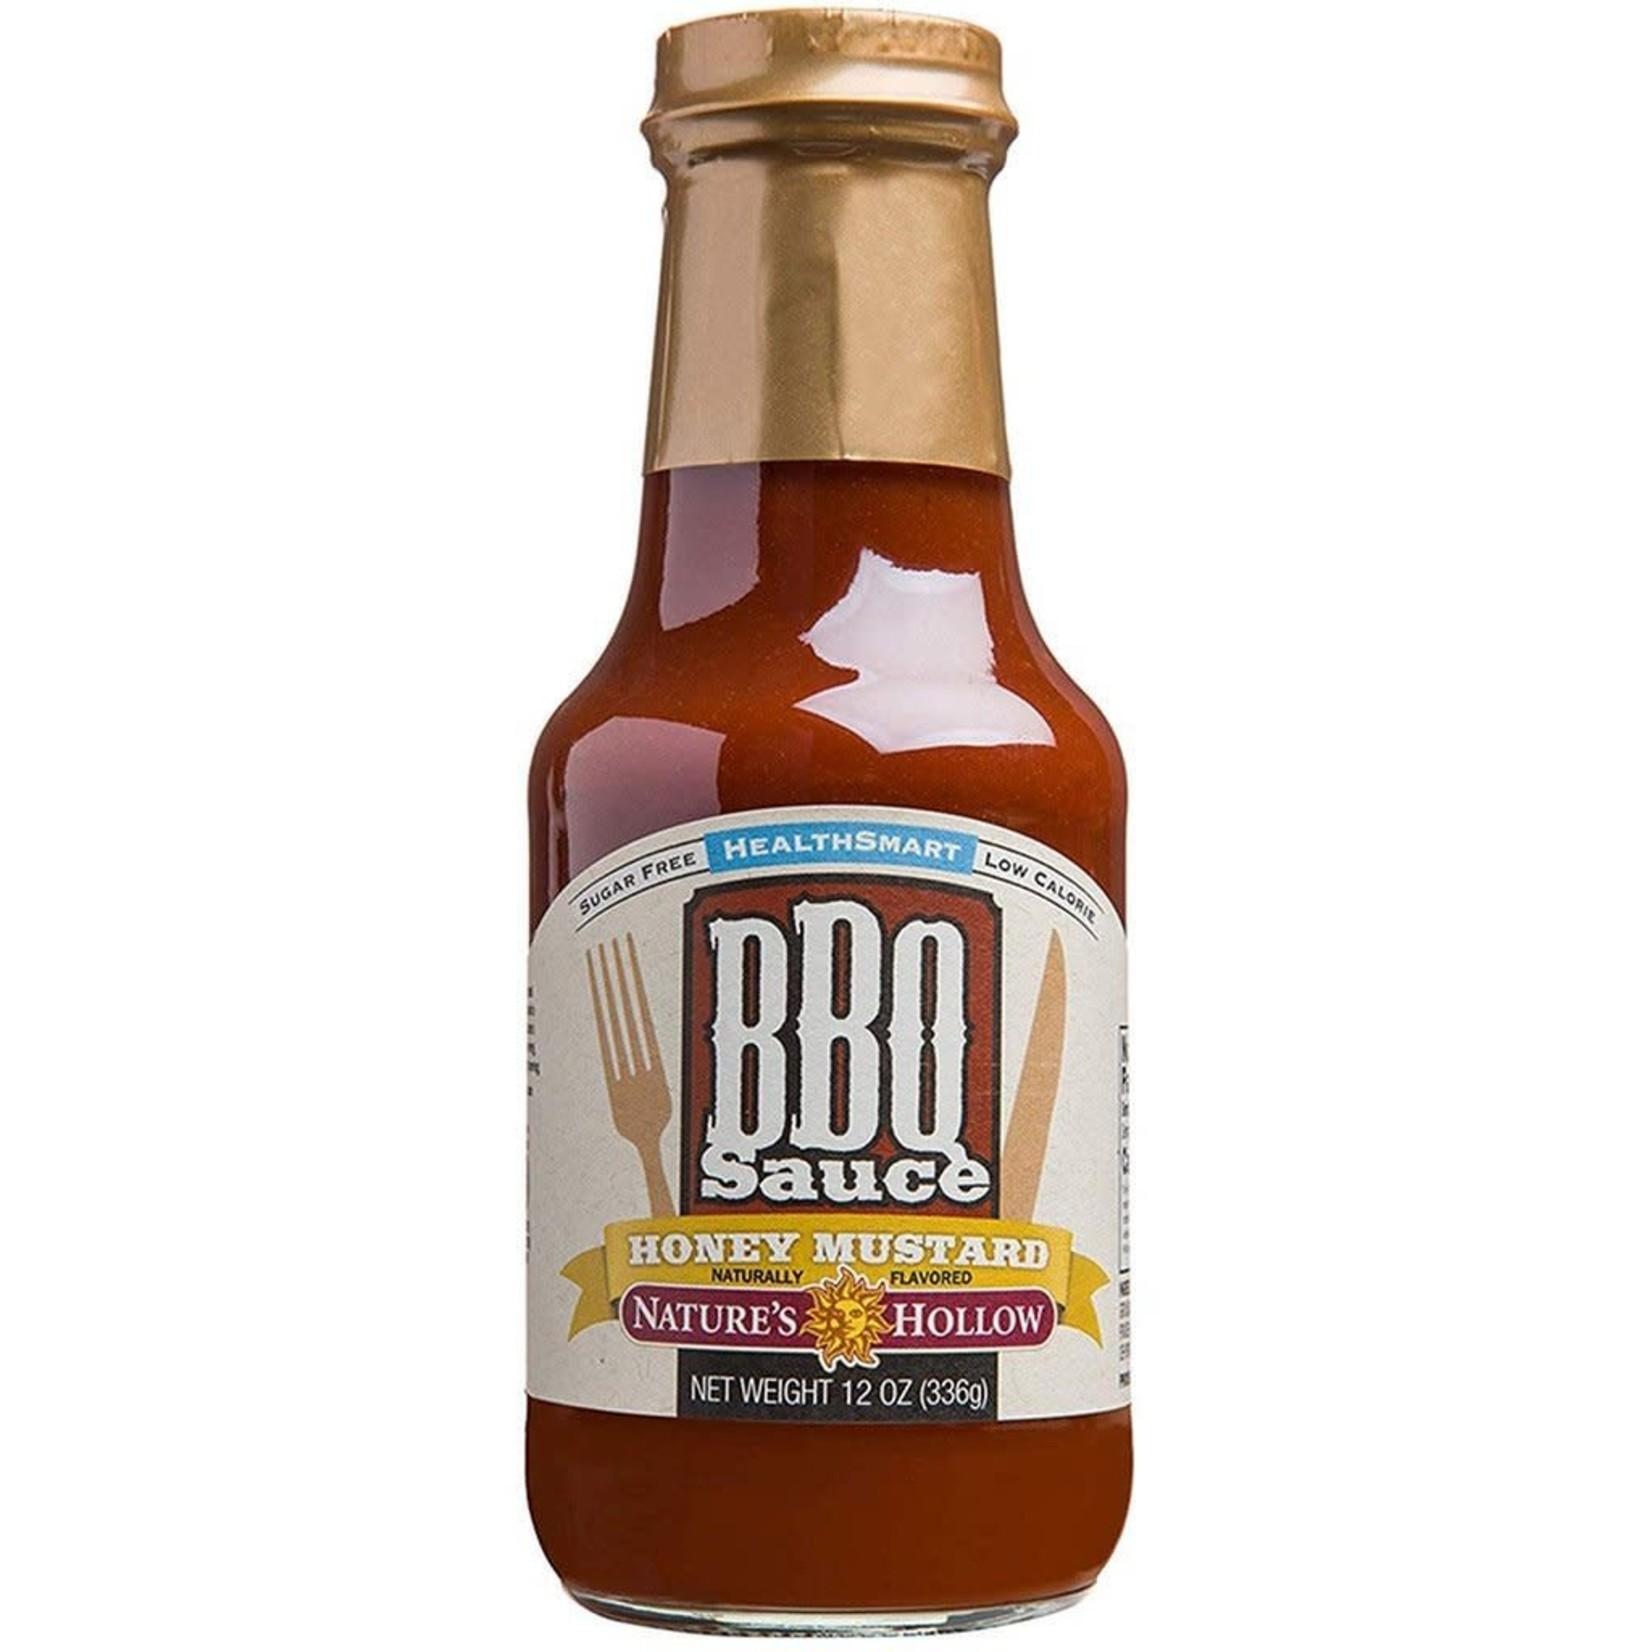 Nature's Hollow Nature's Hollow Honey Mustard BBQ Sauce 355ml